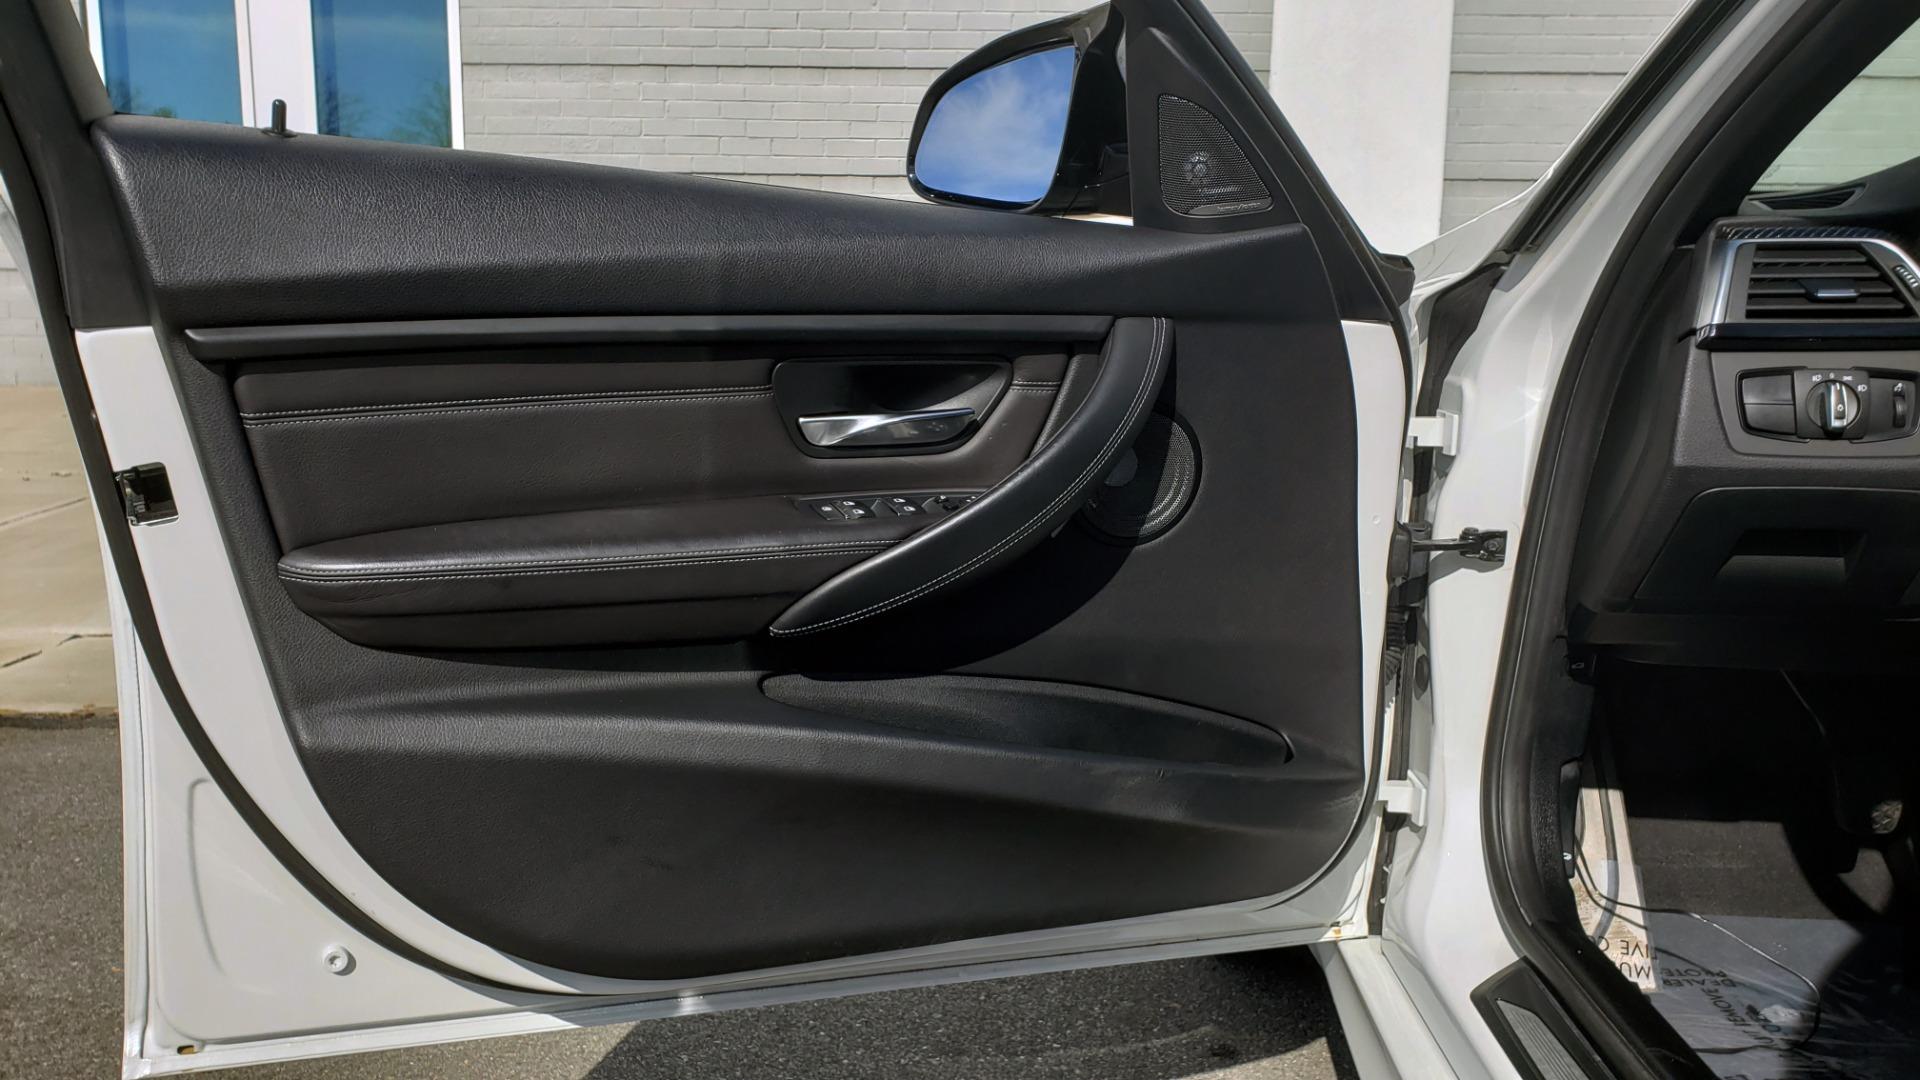 Used 2016 BMW M3 SEDAN / EXECUTIVE PKG / M-SUSPENSION / HARMAN/KARDON SOUND for sale Sold at Formula Imports in Charlotte NC 28227 35